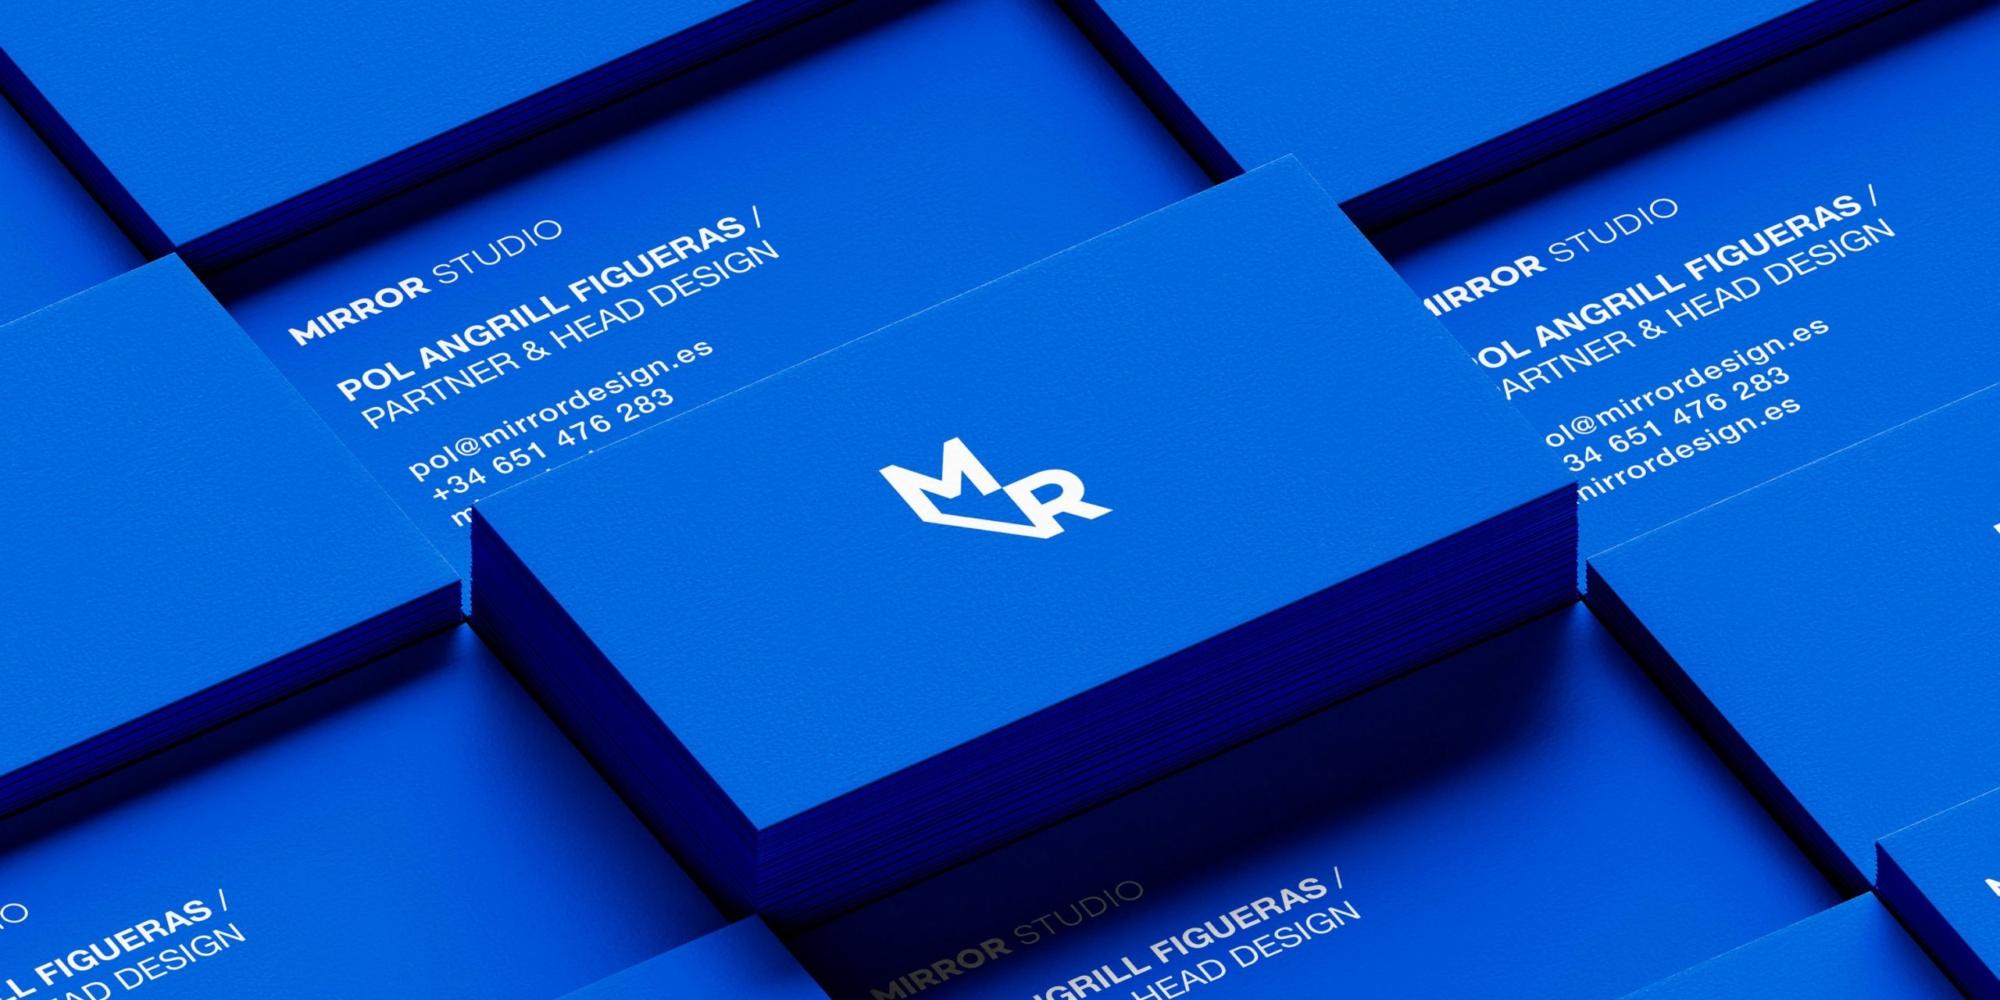 business card design for mirror studio